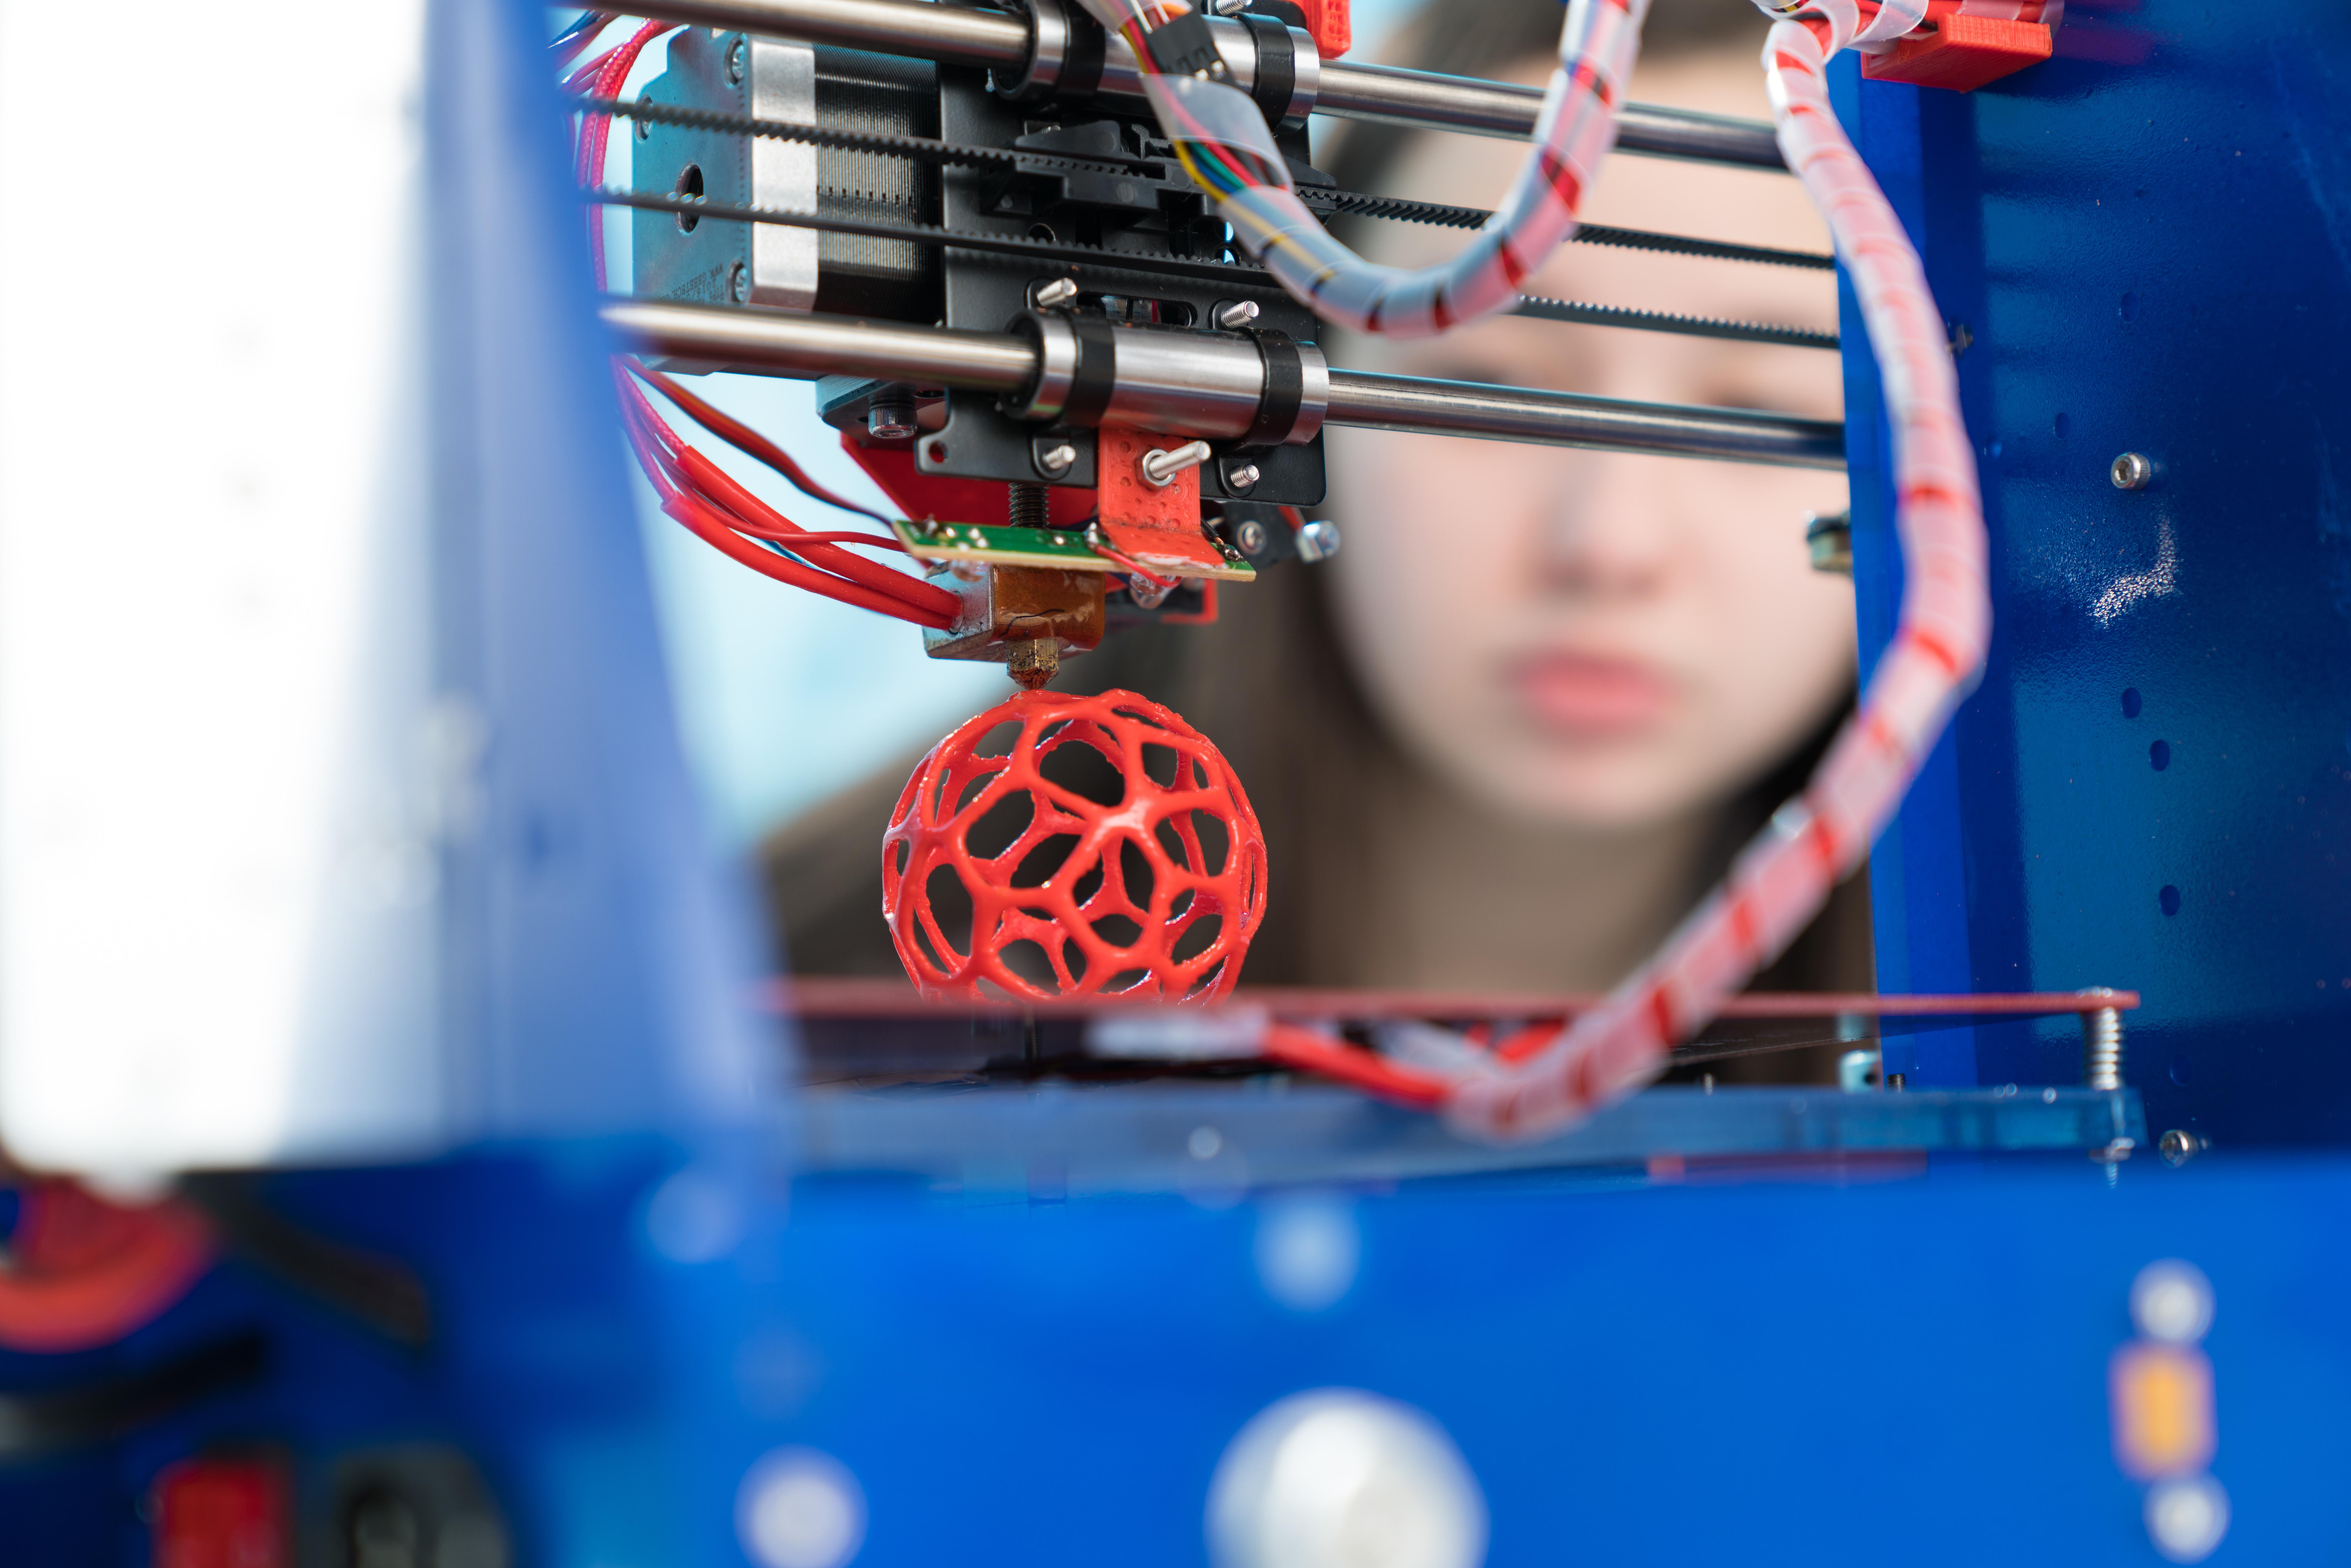 3d printer with sphere being printed